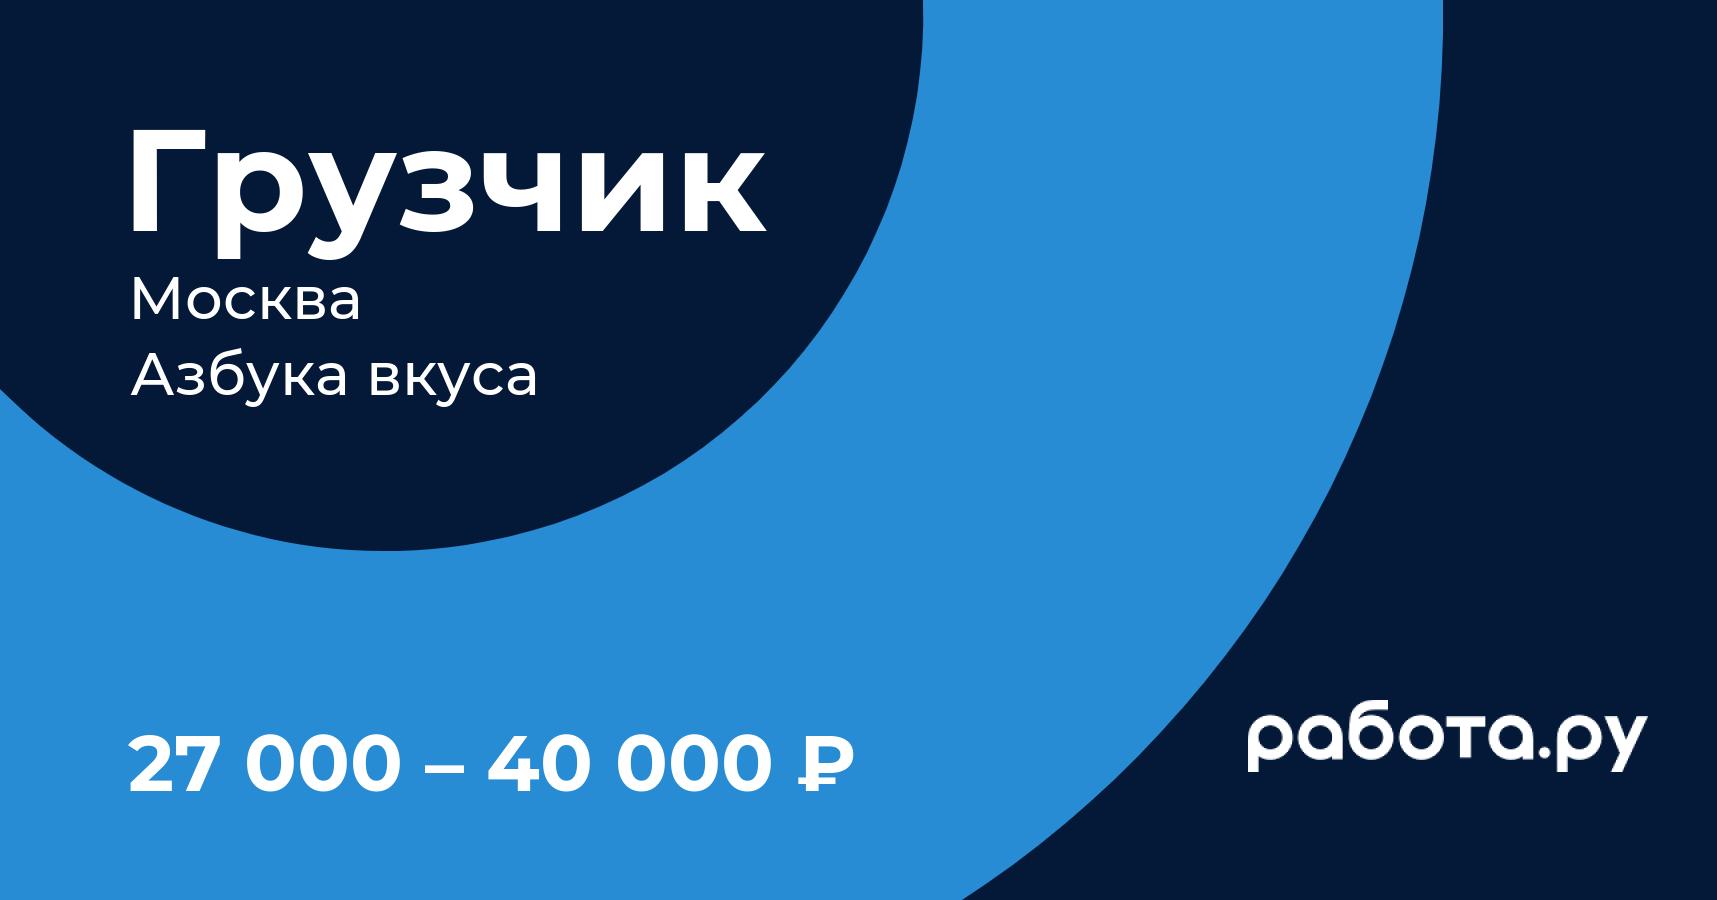 Удаленная работа на дому в москве вакансии от прямых работодателей в москве удаленная работа онлайн-консультант